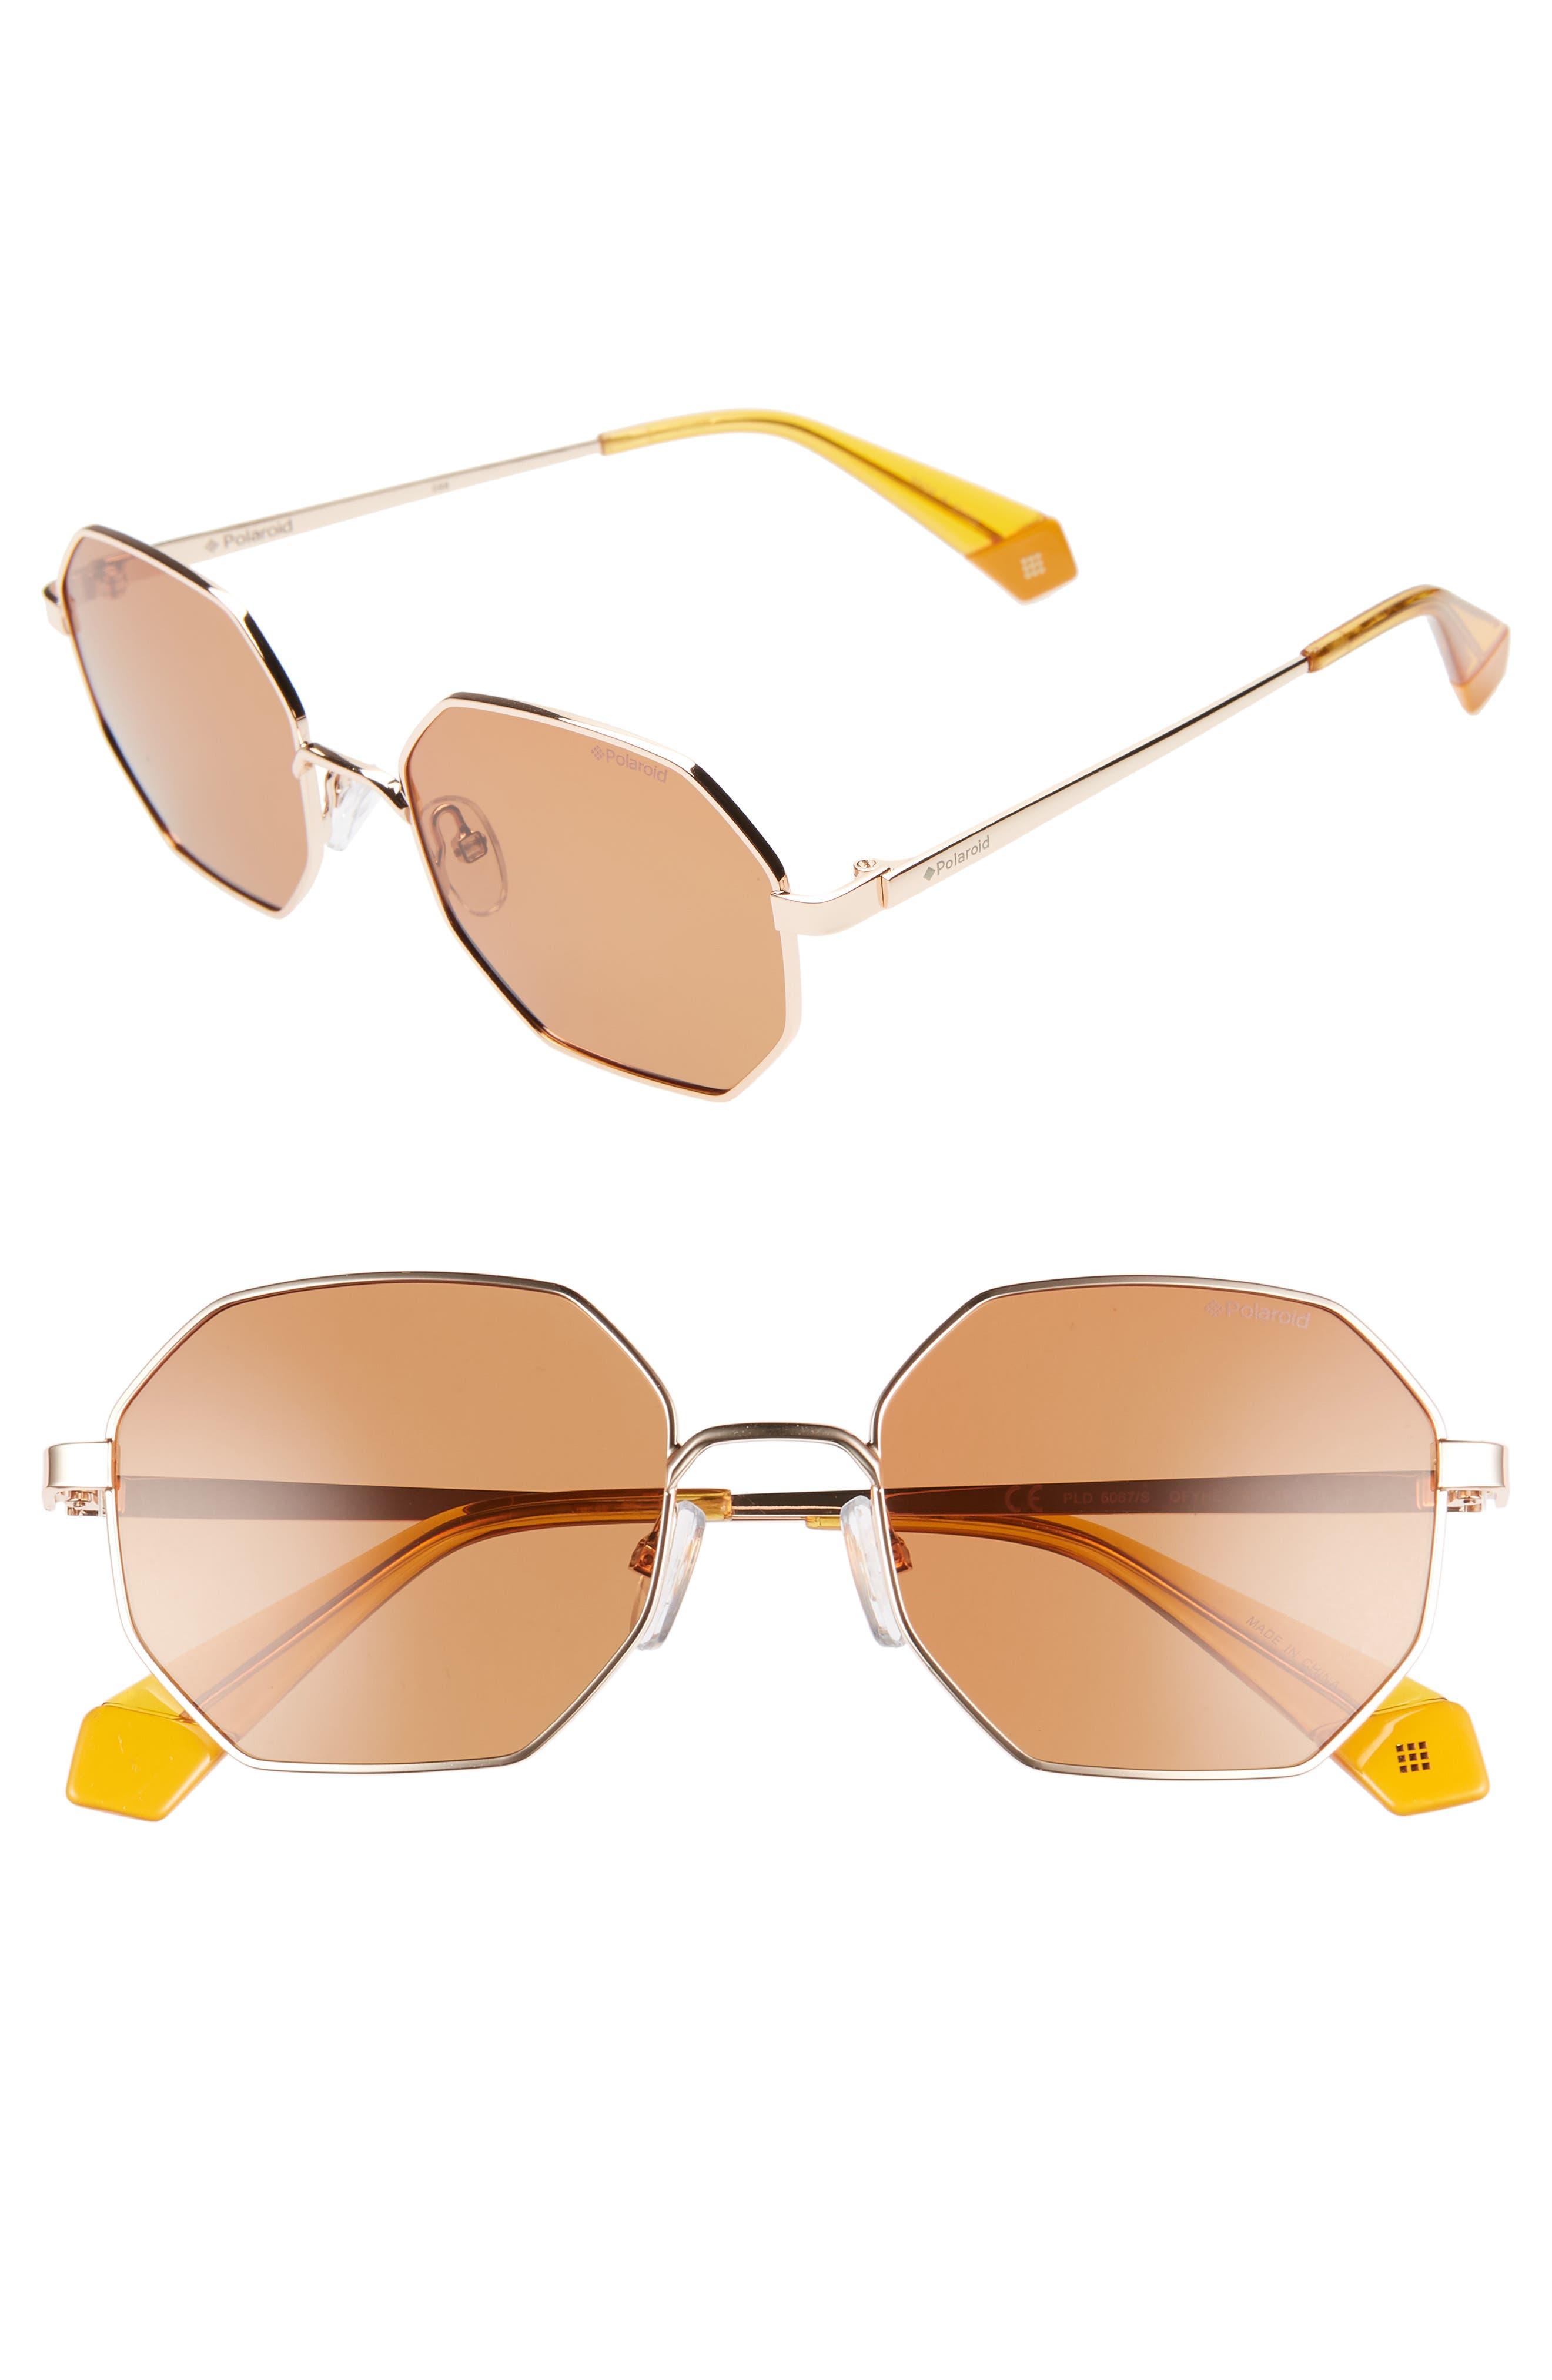 Polaroid 5m Geometric Polarized Sunglasses - Gold/ Light Red